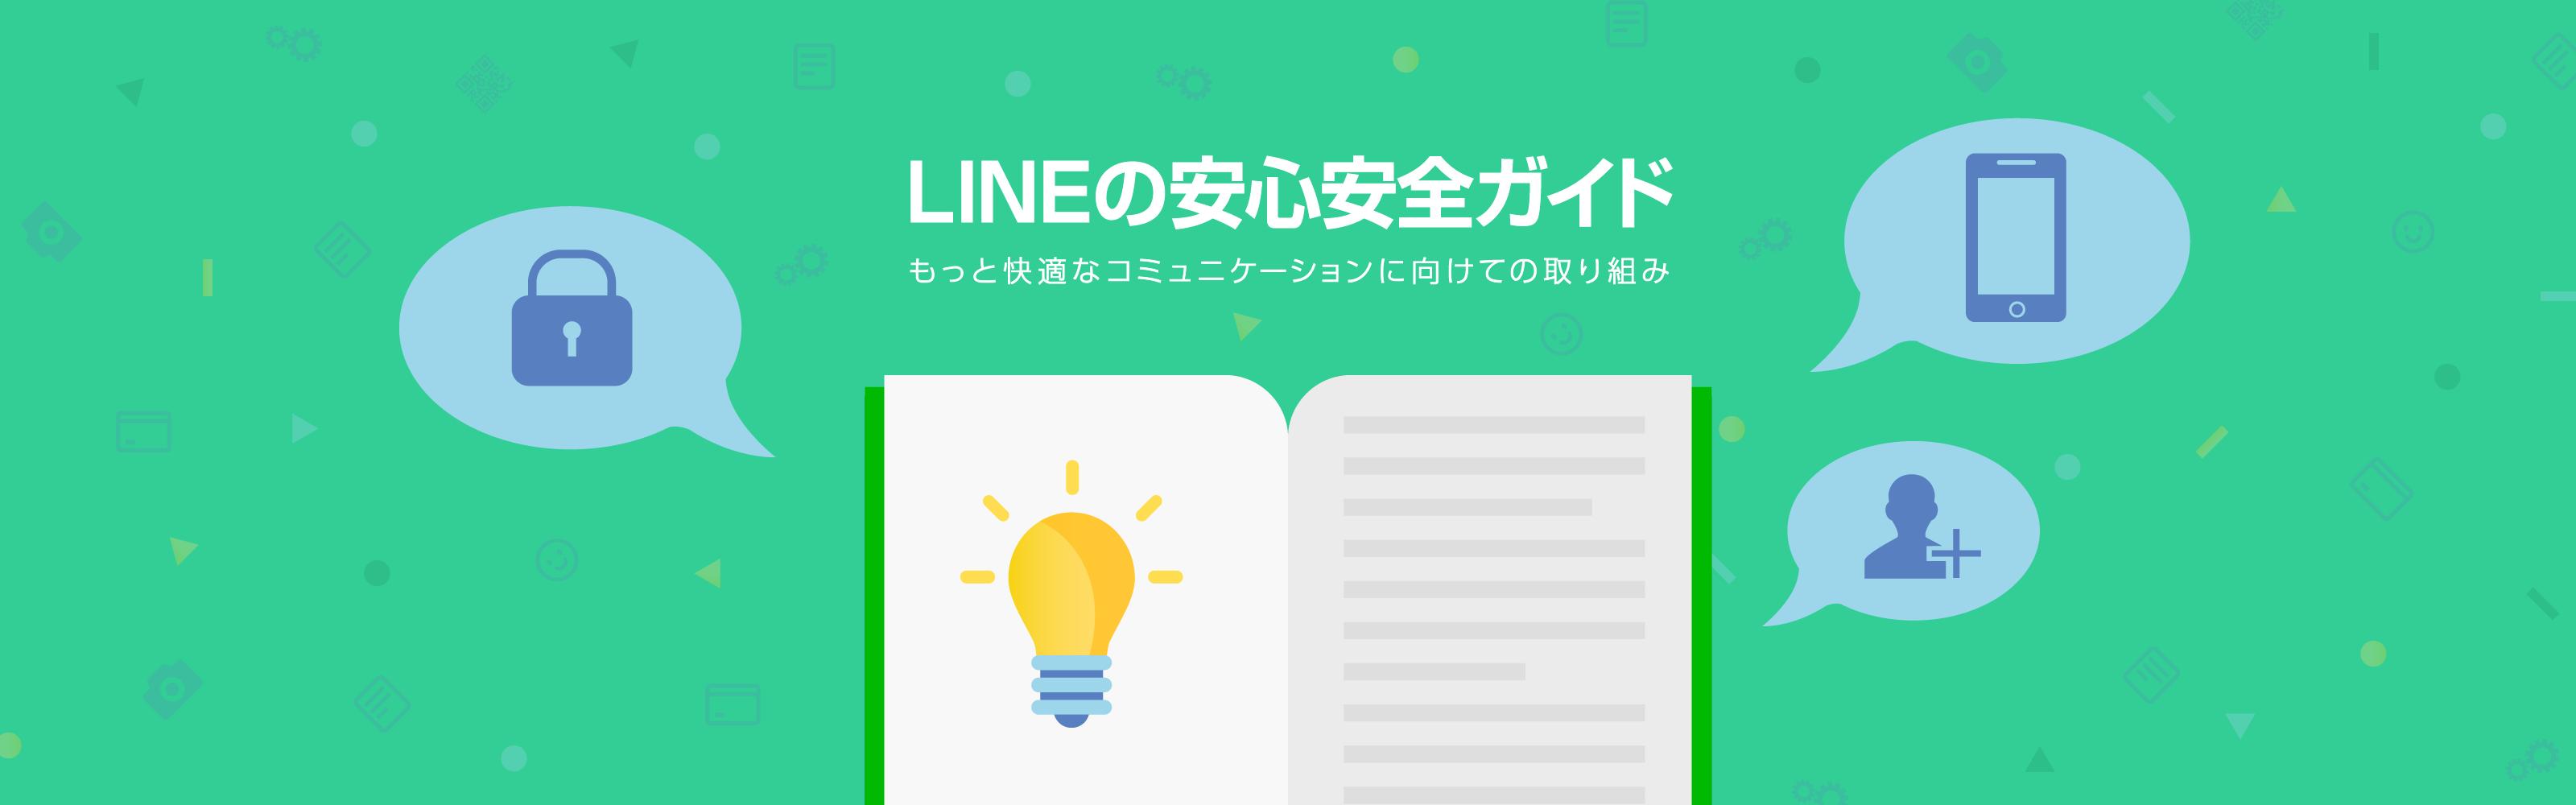 LINEの安心安全ガイド もっと快適なコミュニケーションに向けての取り組み